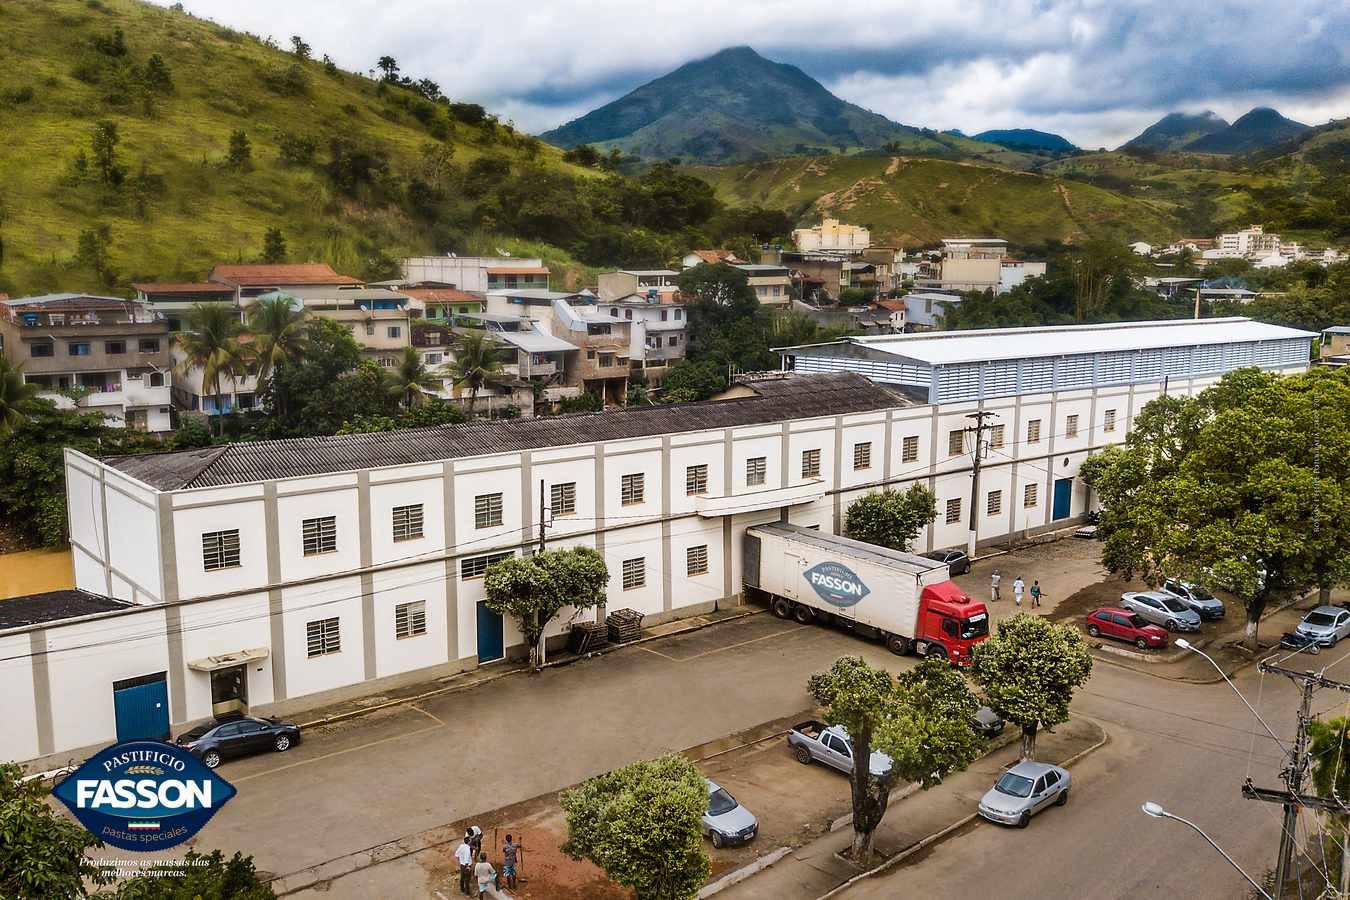 Fabrica Pastificio Fasson em astoufo Dutra mg